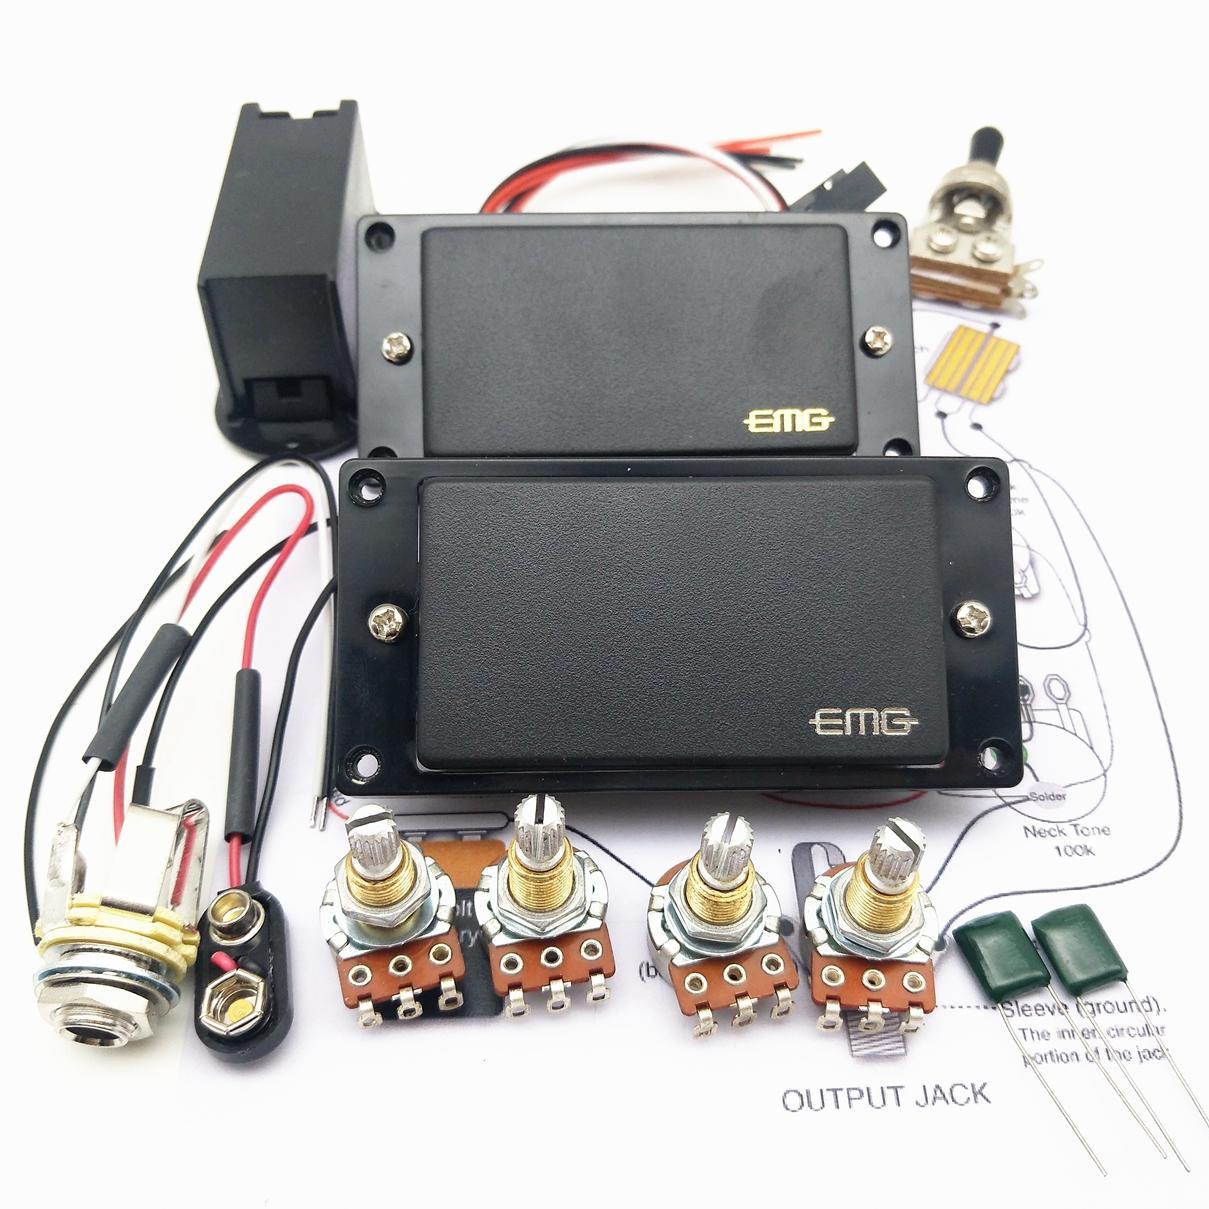 2020 Emg 81 85 Active Pickup Electric Guitar Pickups With 25k Potentiometer Parts Black From Allguitar 21 9 Dhgate Com